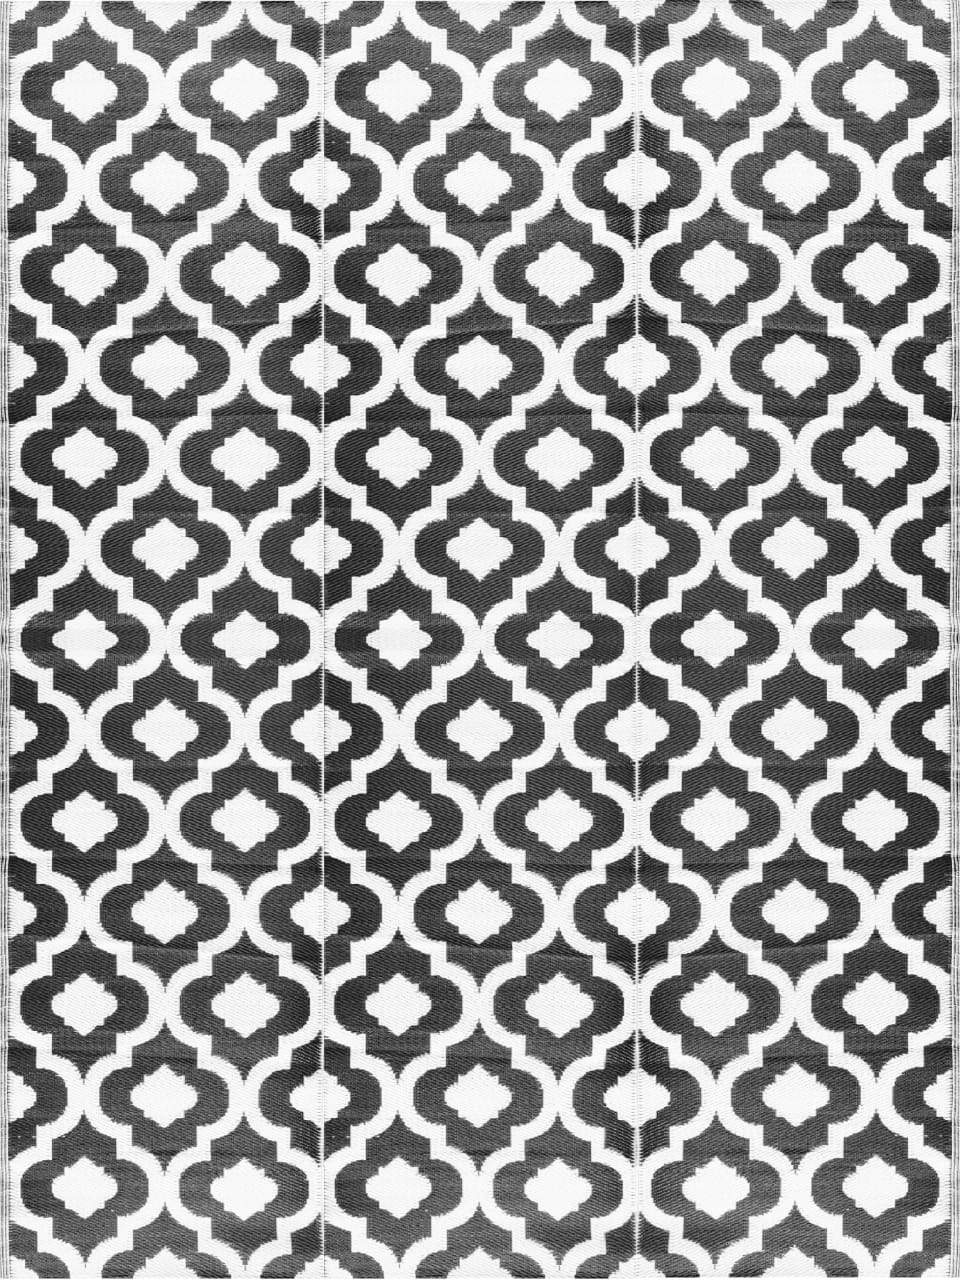 balajeesusa 9 x12 indoor outdoor rugs patio mat plastic straw camping rug rv picnic mats wholesale price black white 54514